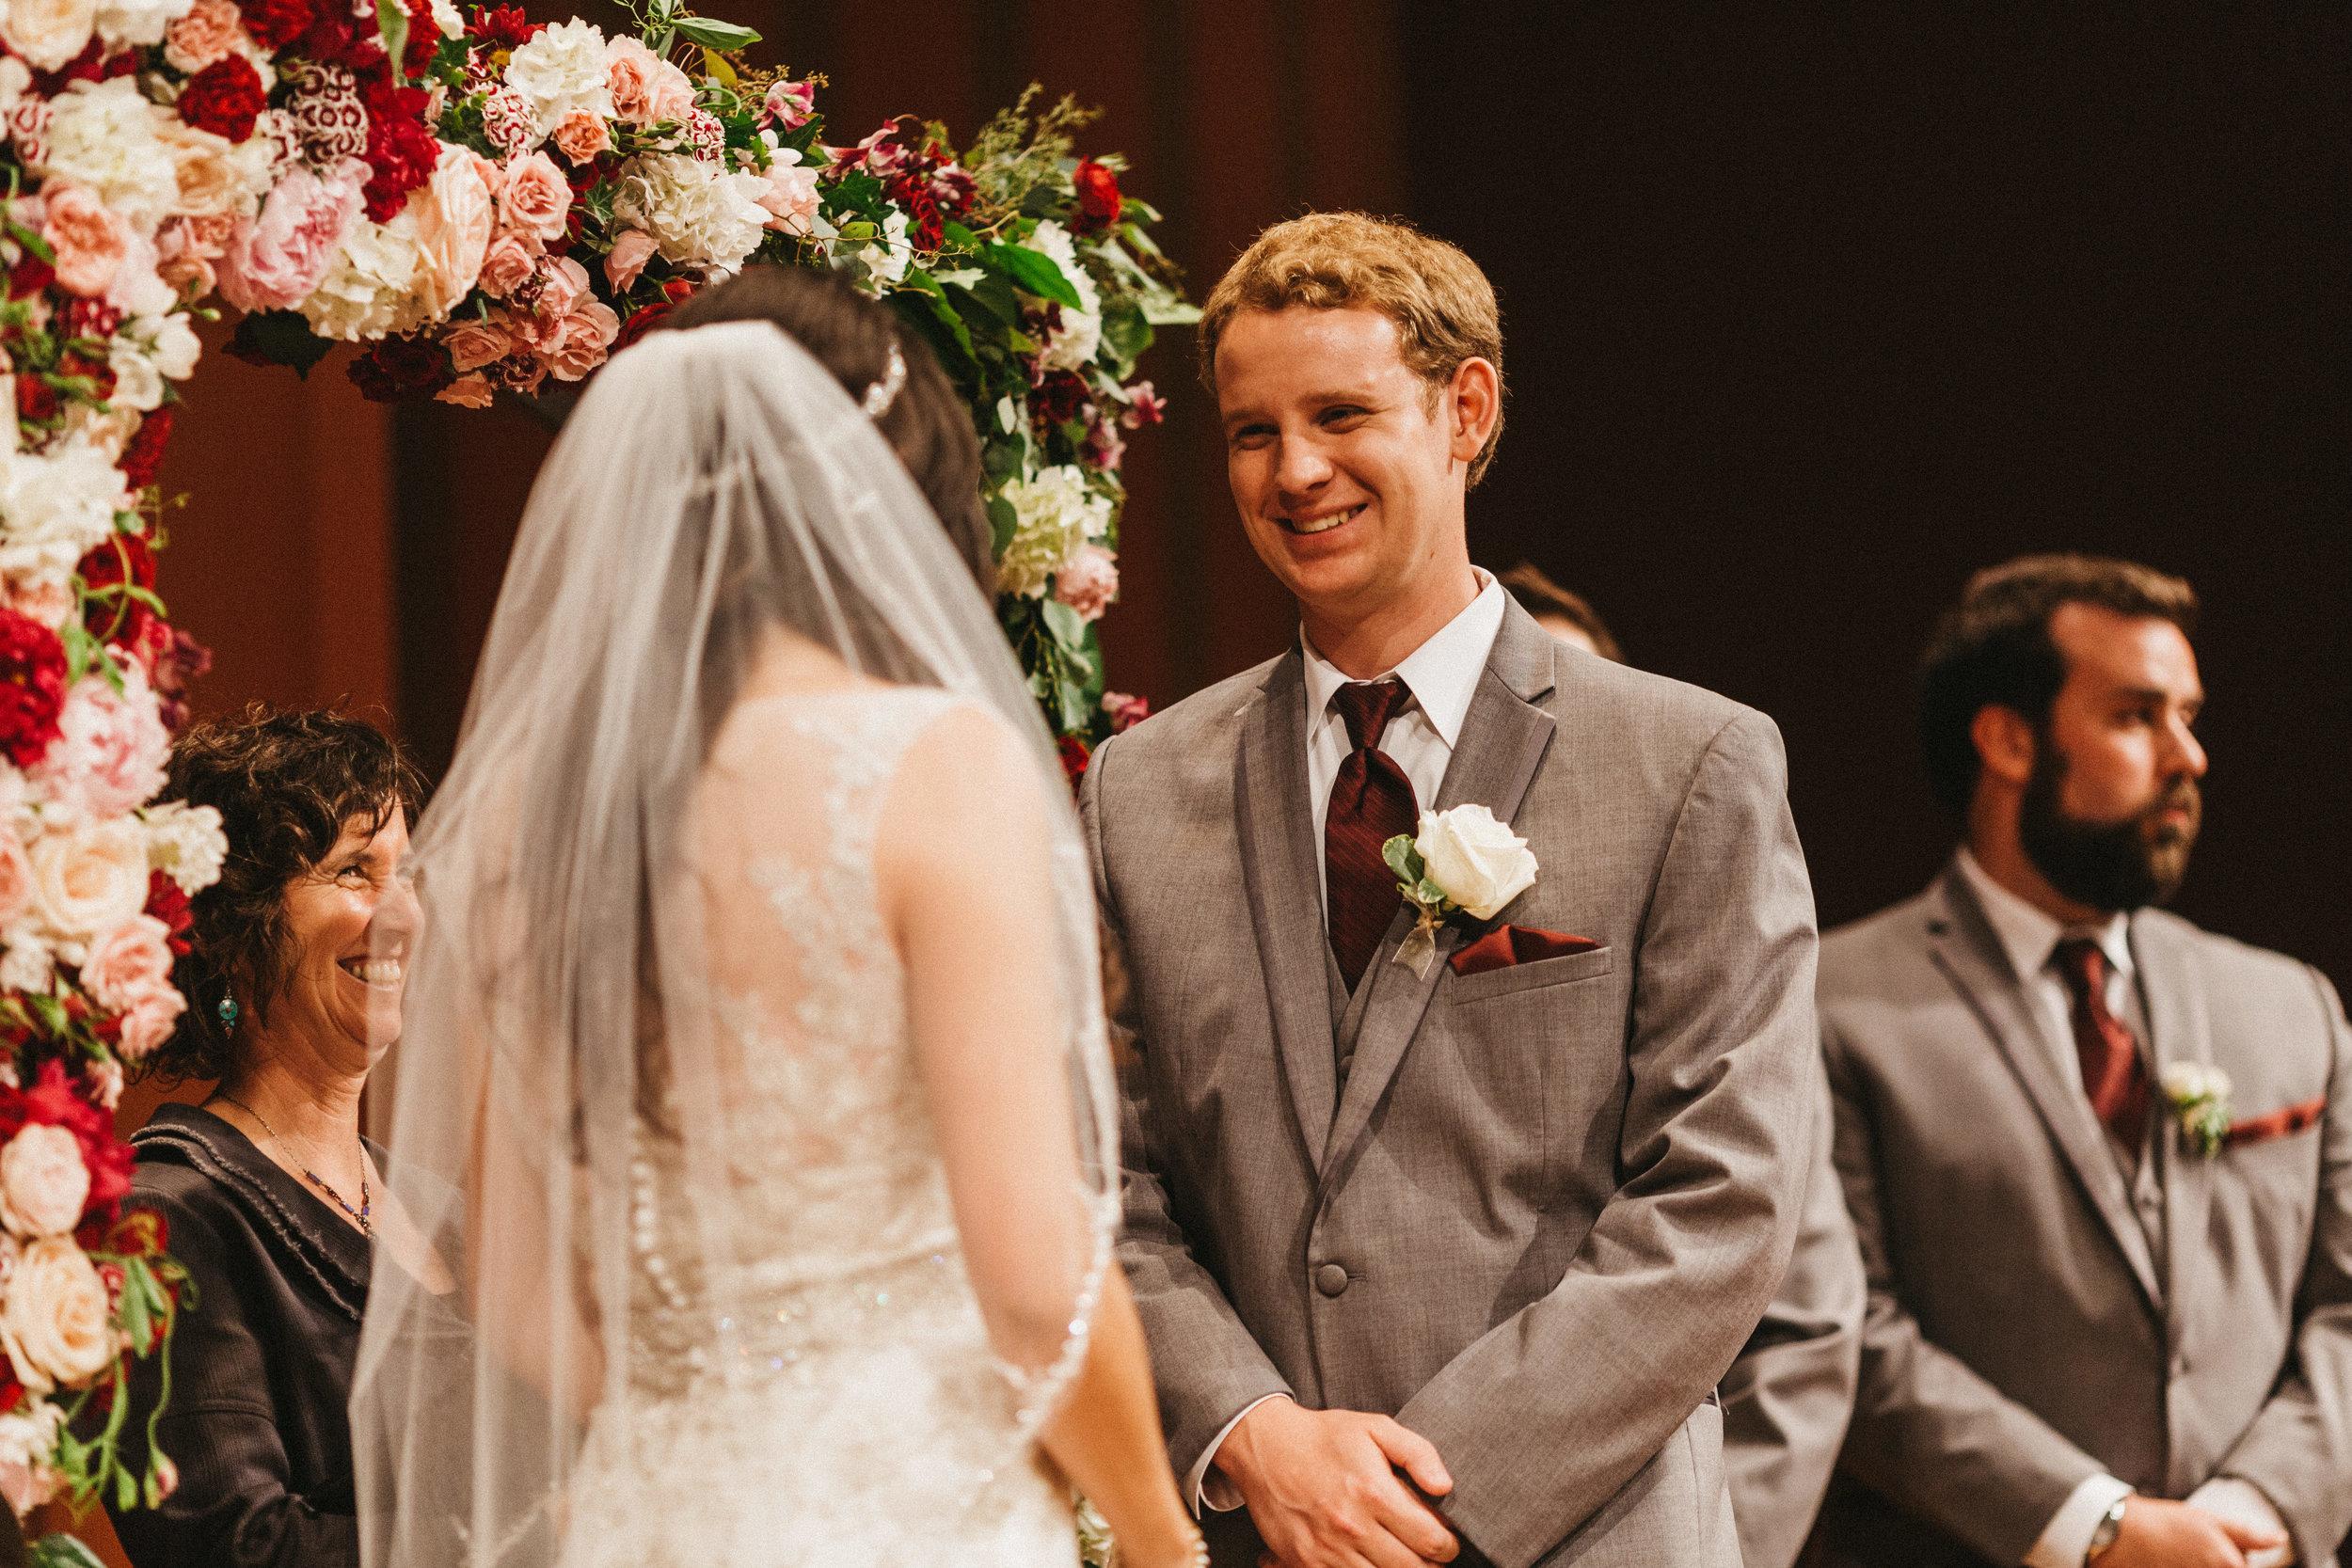 kelsey-connor-wedding-large-463.jpg